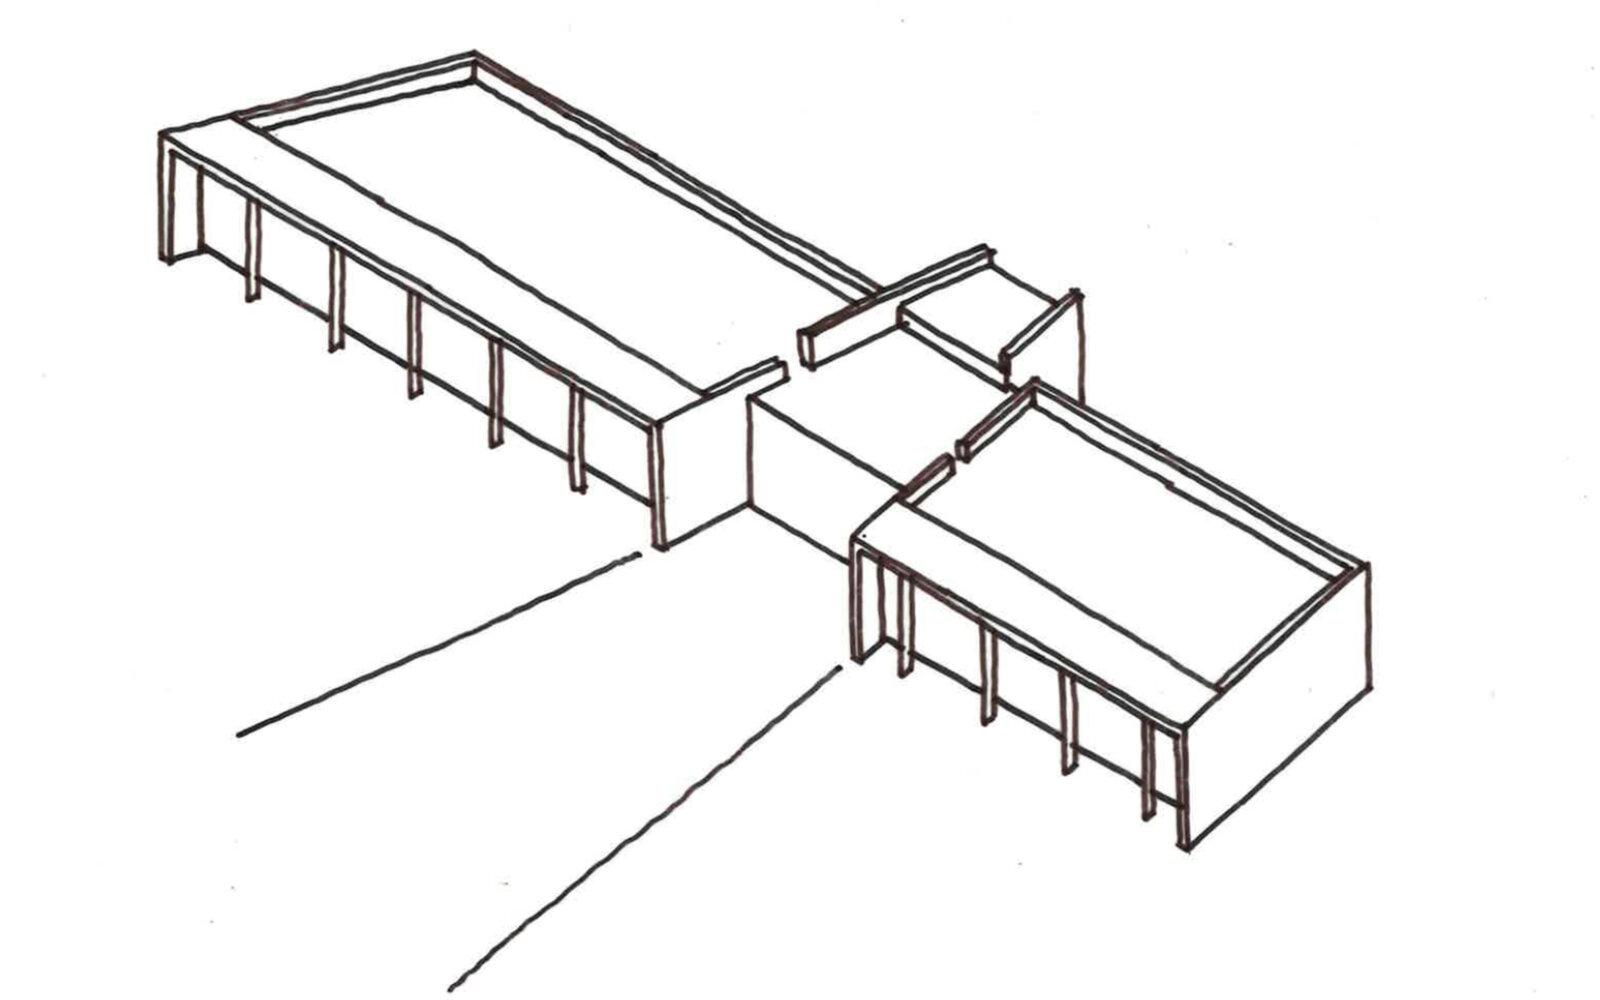 Knowledge Gateway Building University of Essex sketch